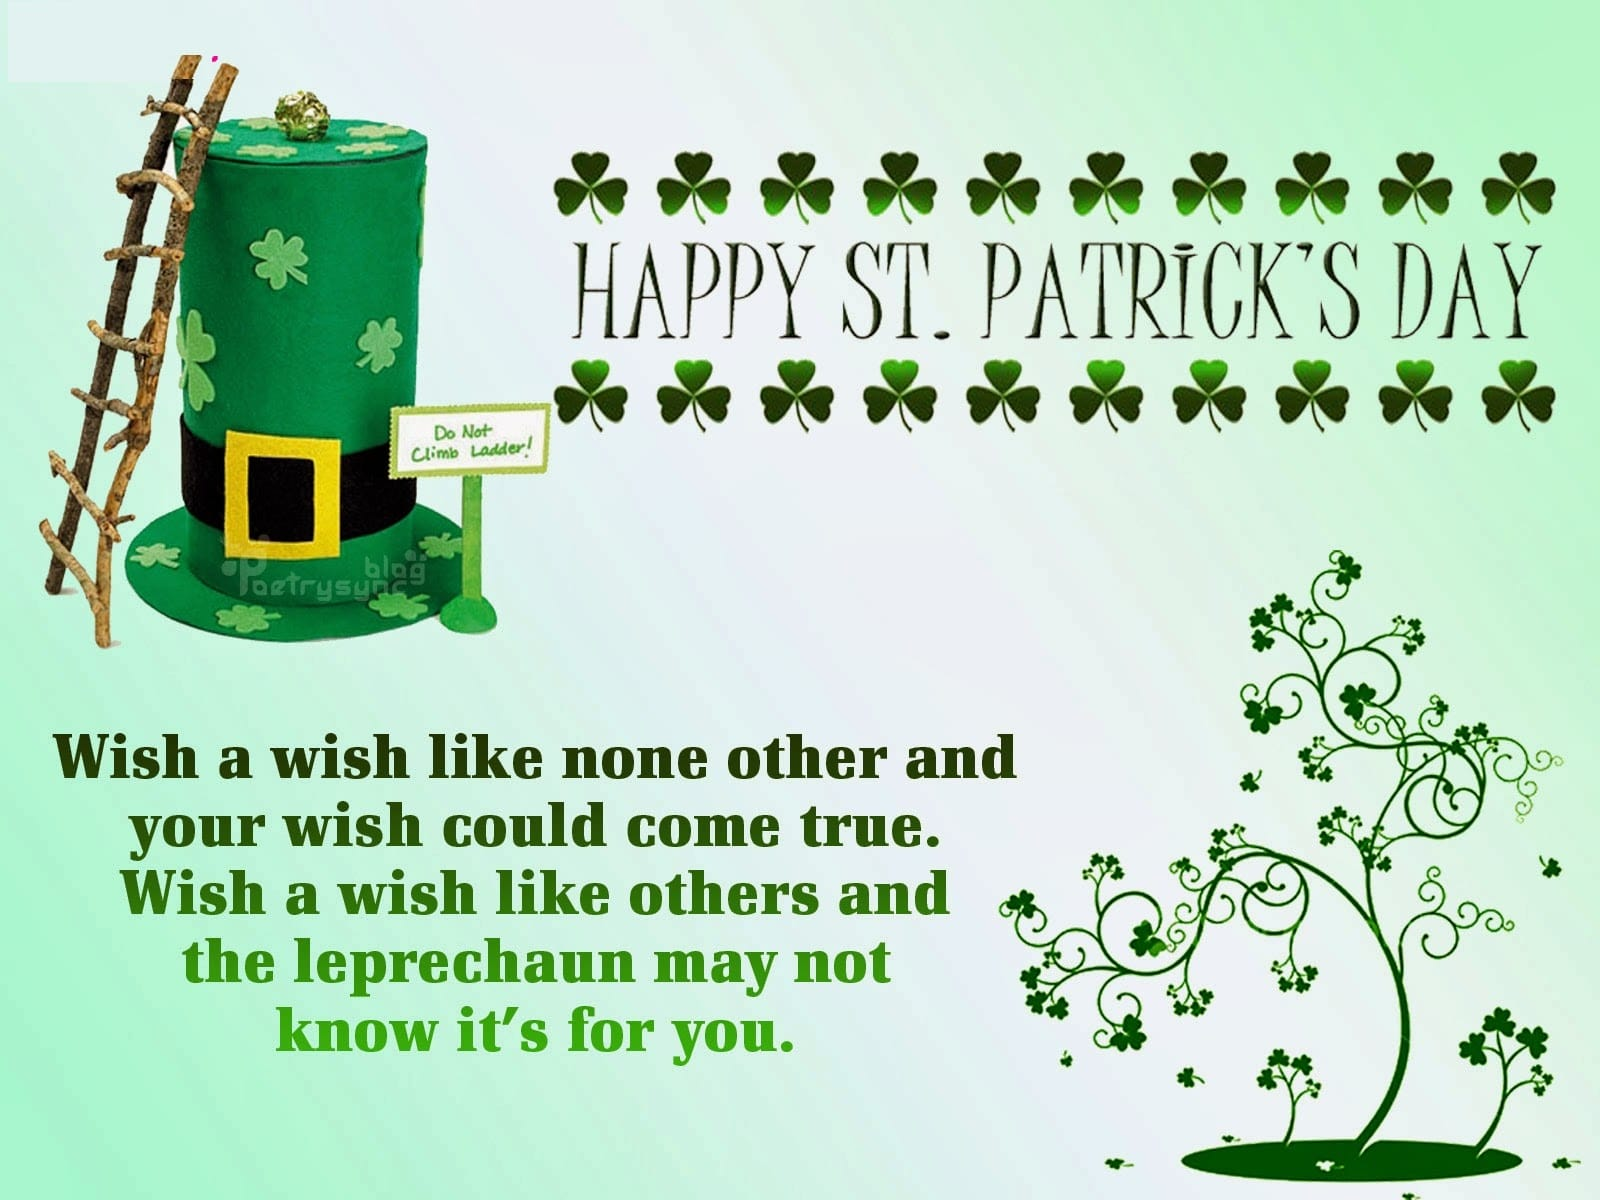 St. Patricks Day Message 2018